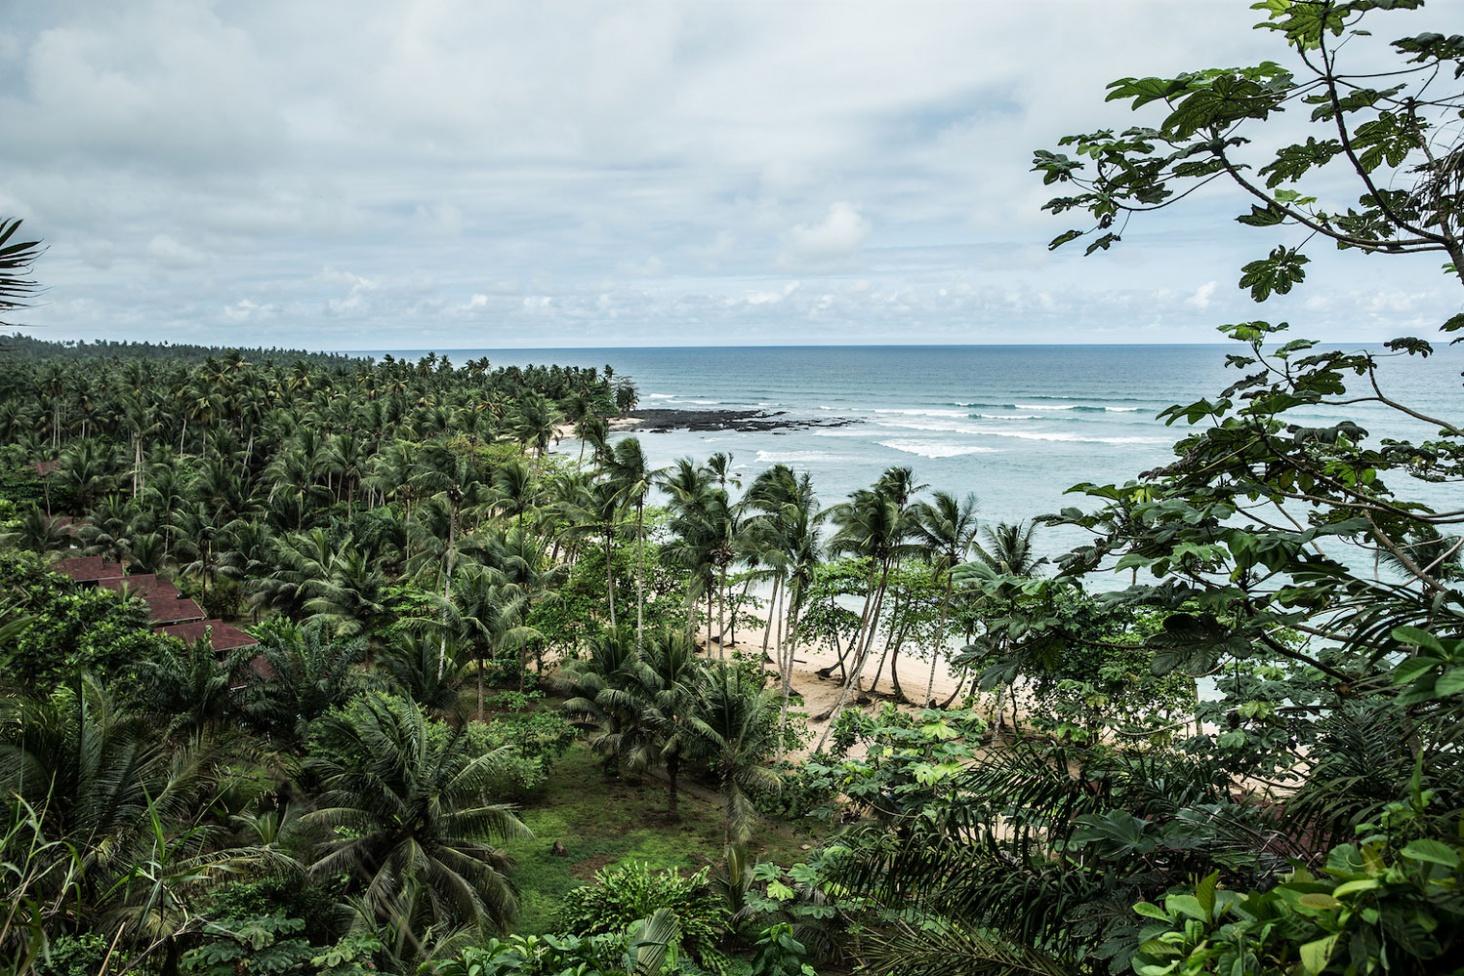 02_Sao-Tome-Surf1-15-JPG-167